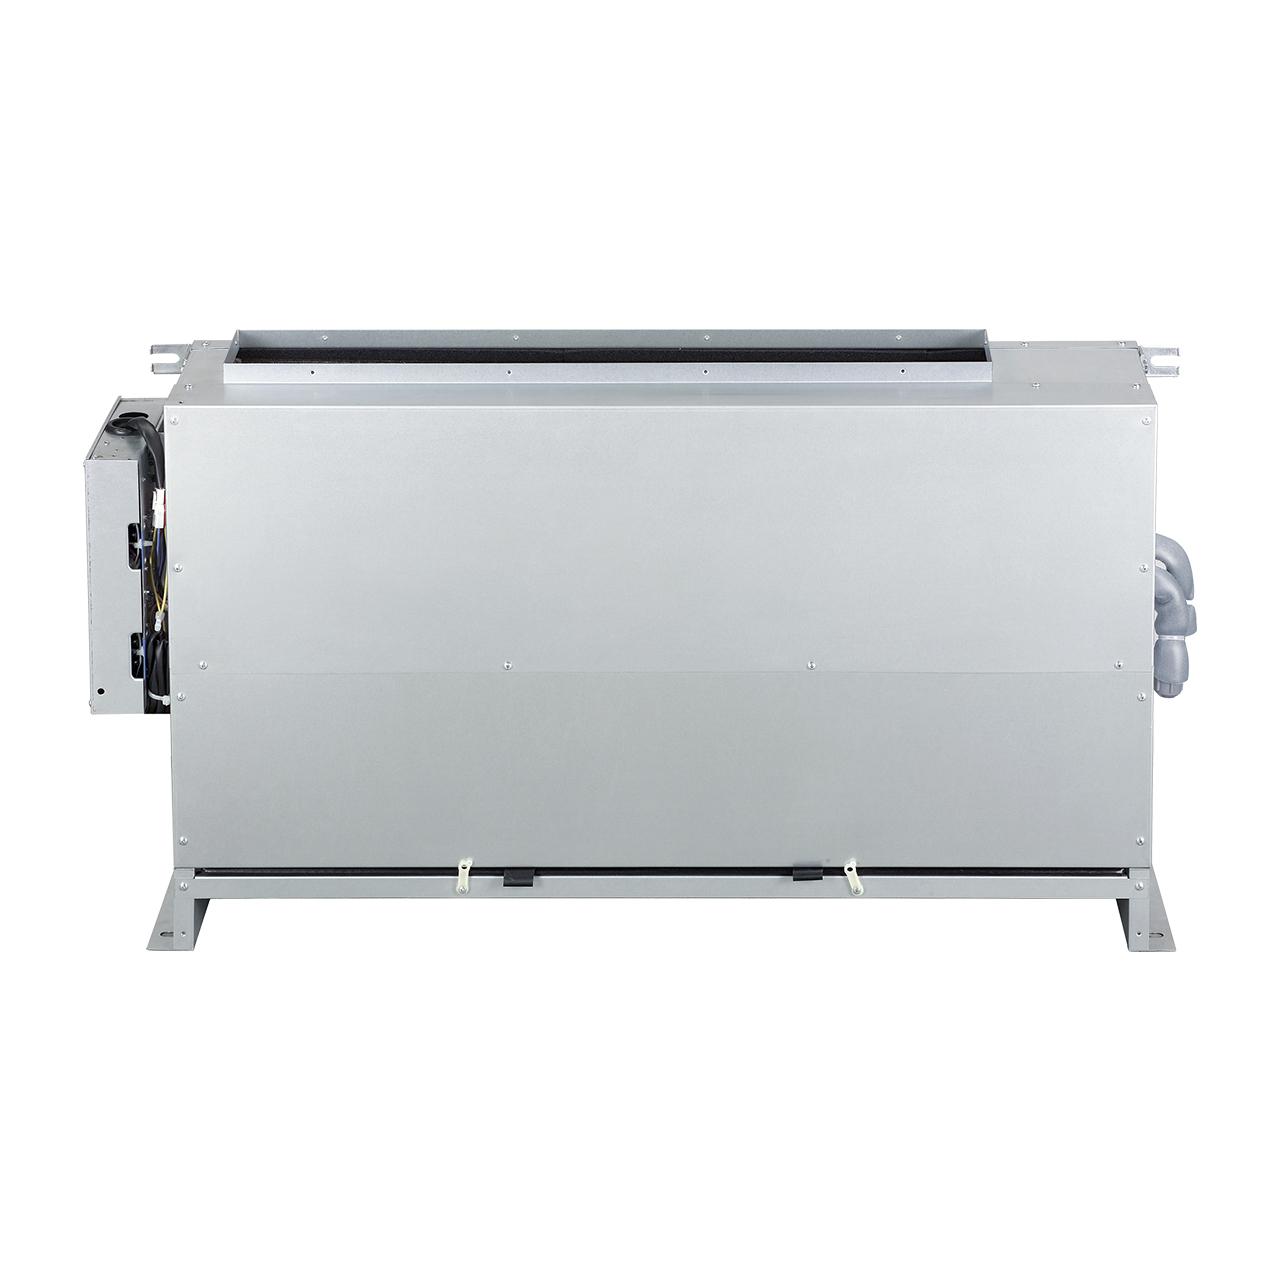 xct7-indoor-units-console-recessed